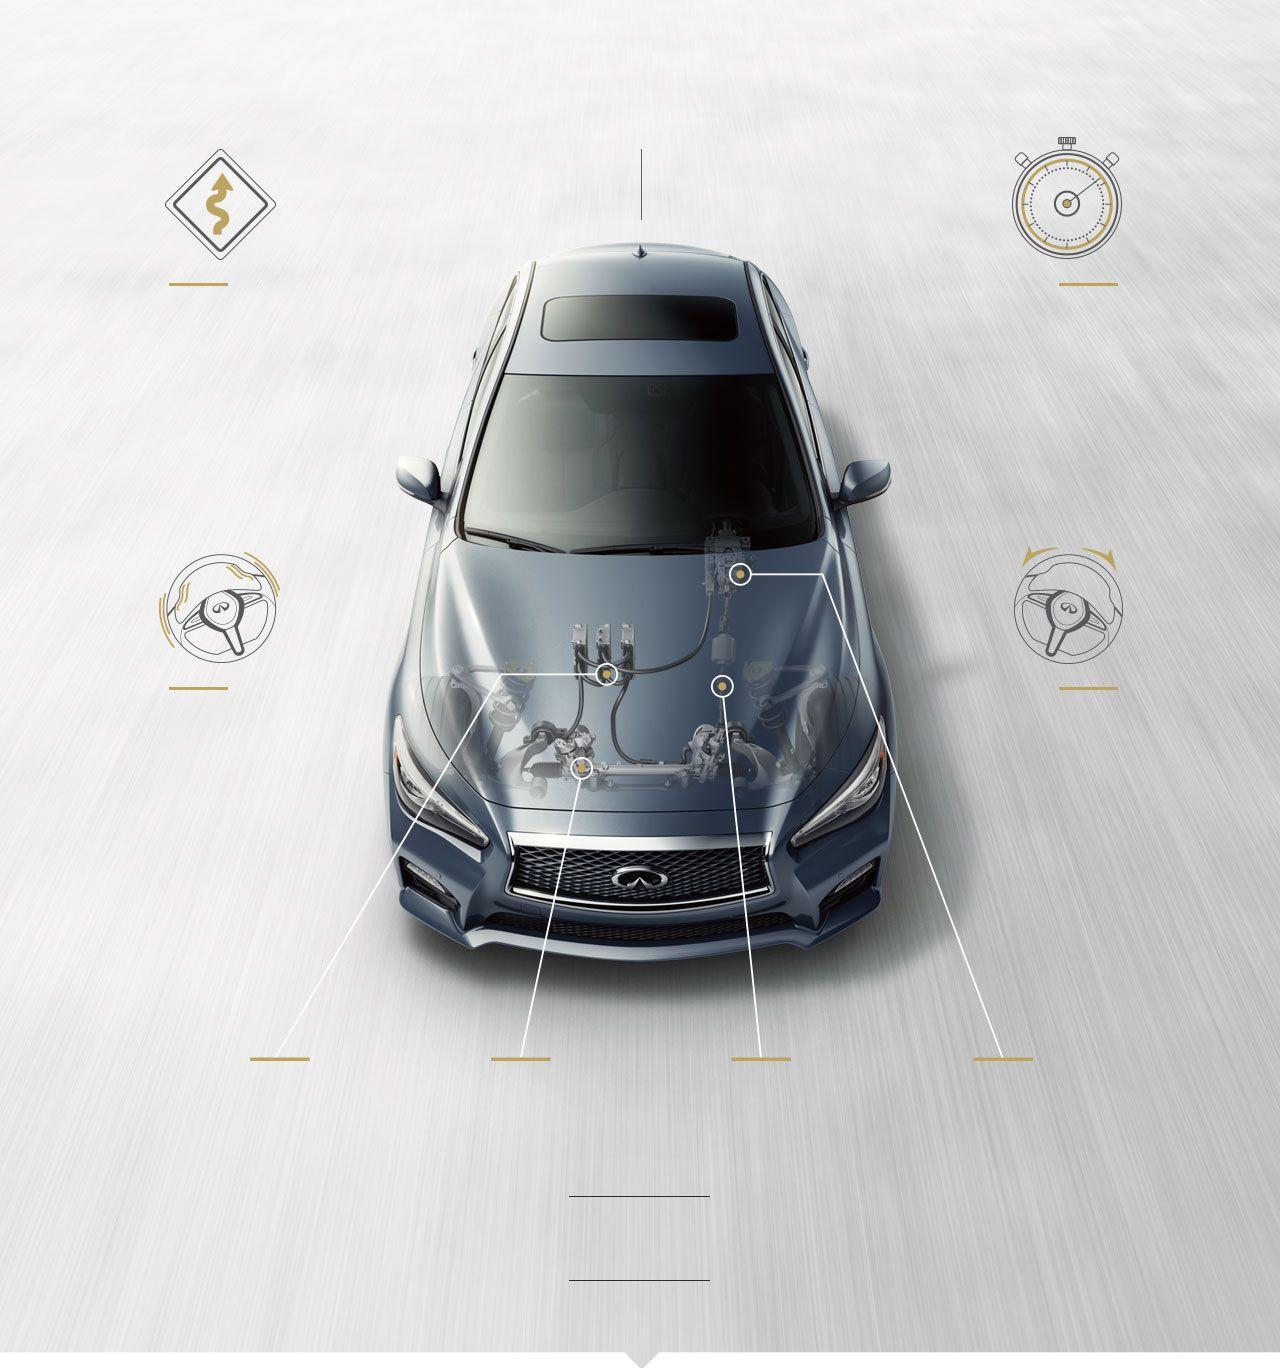 2015 Infiniti Q50 Sedan Performance | Exterior front-view diagram  highlighting Direct Adaptive Steering driving